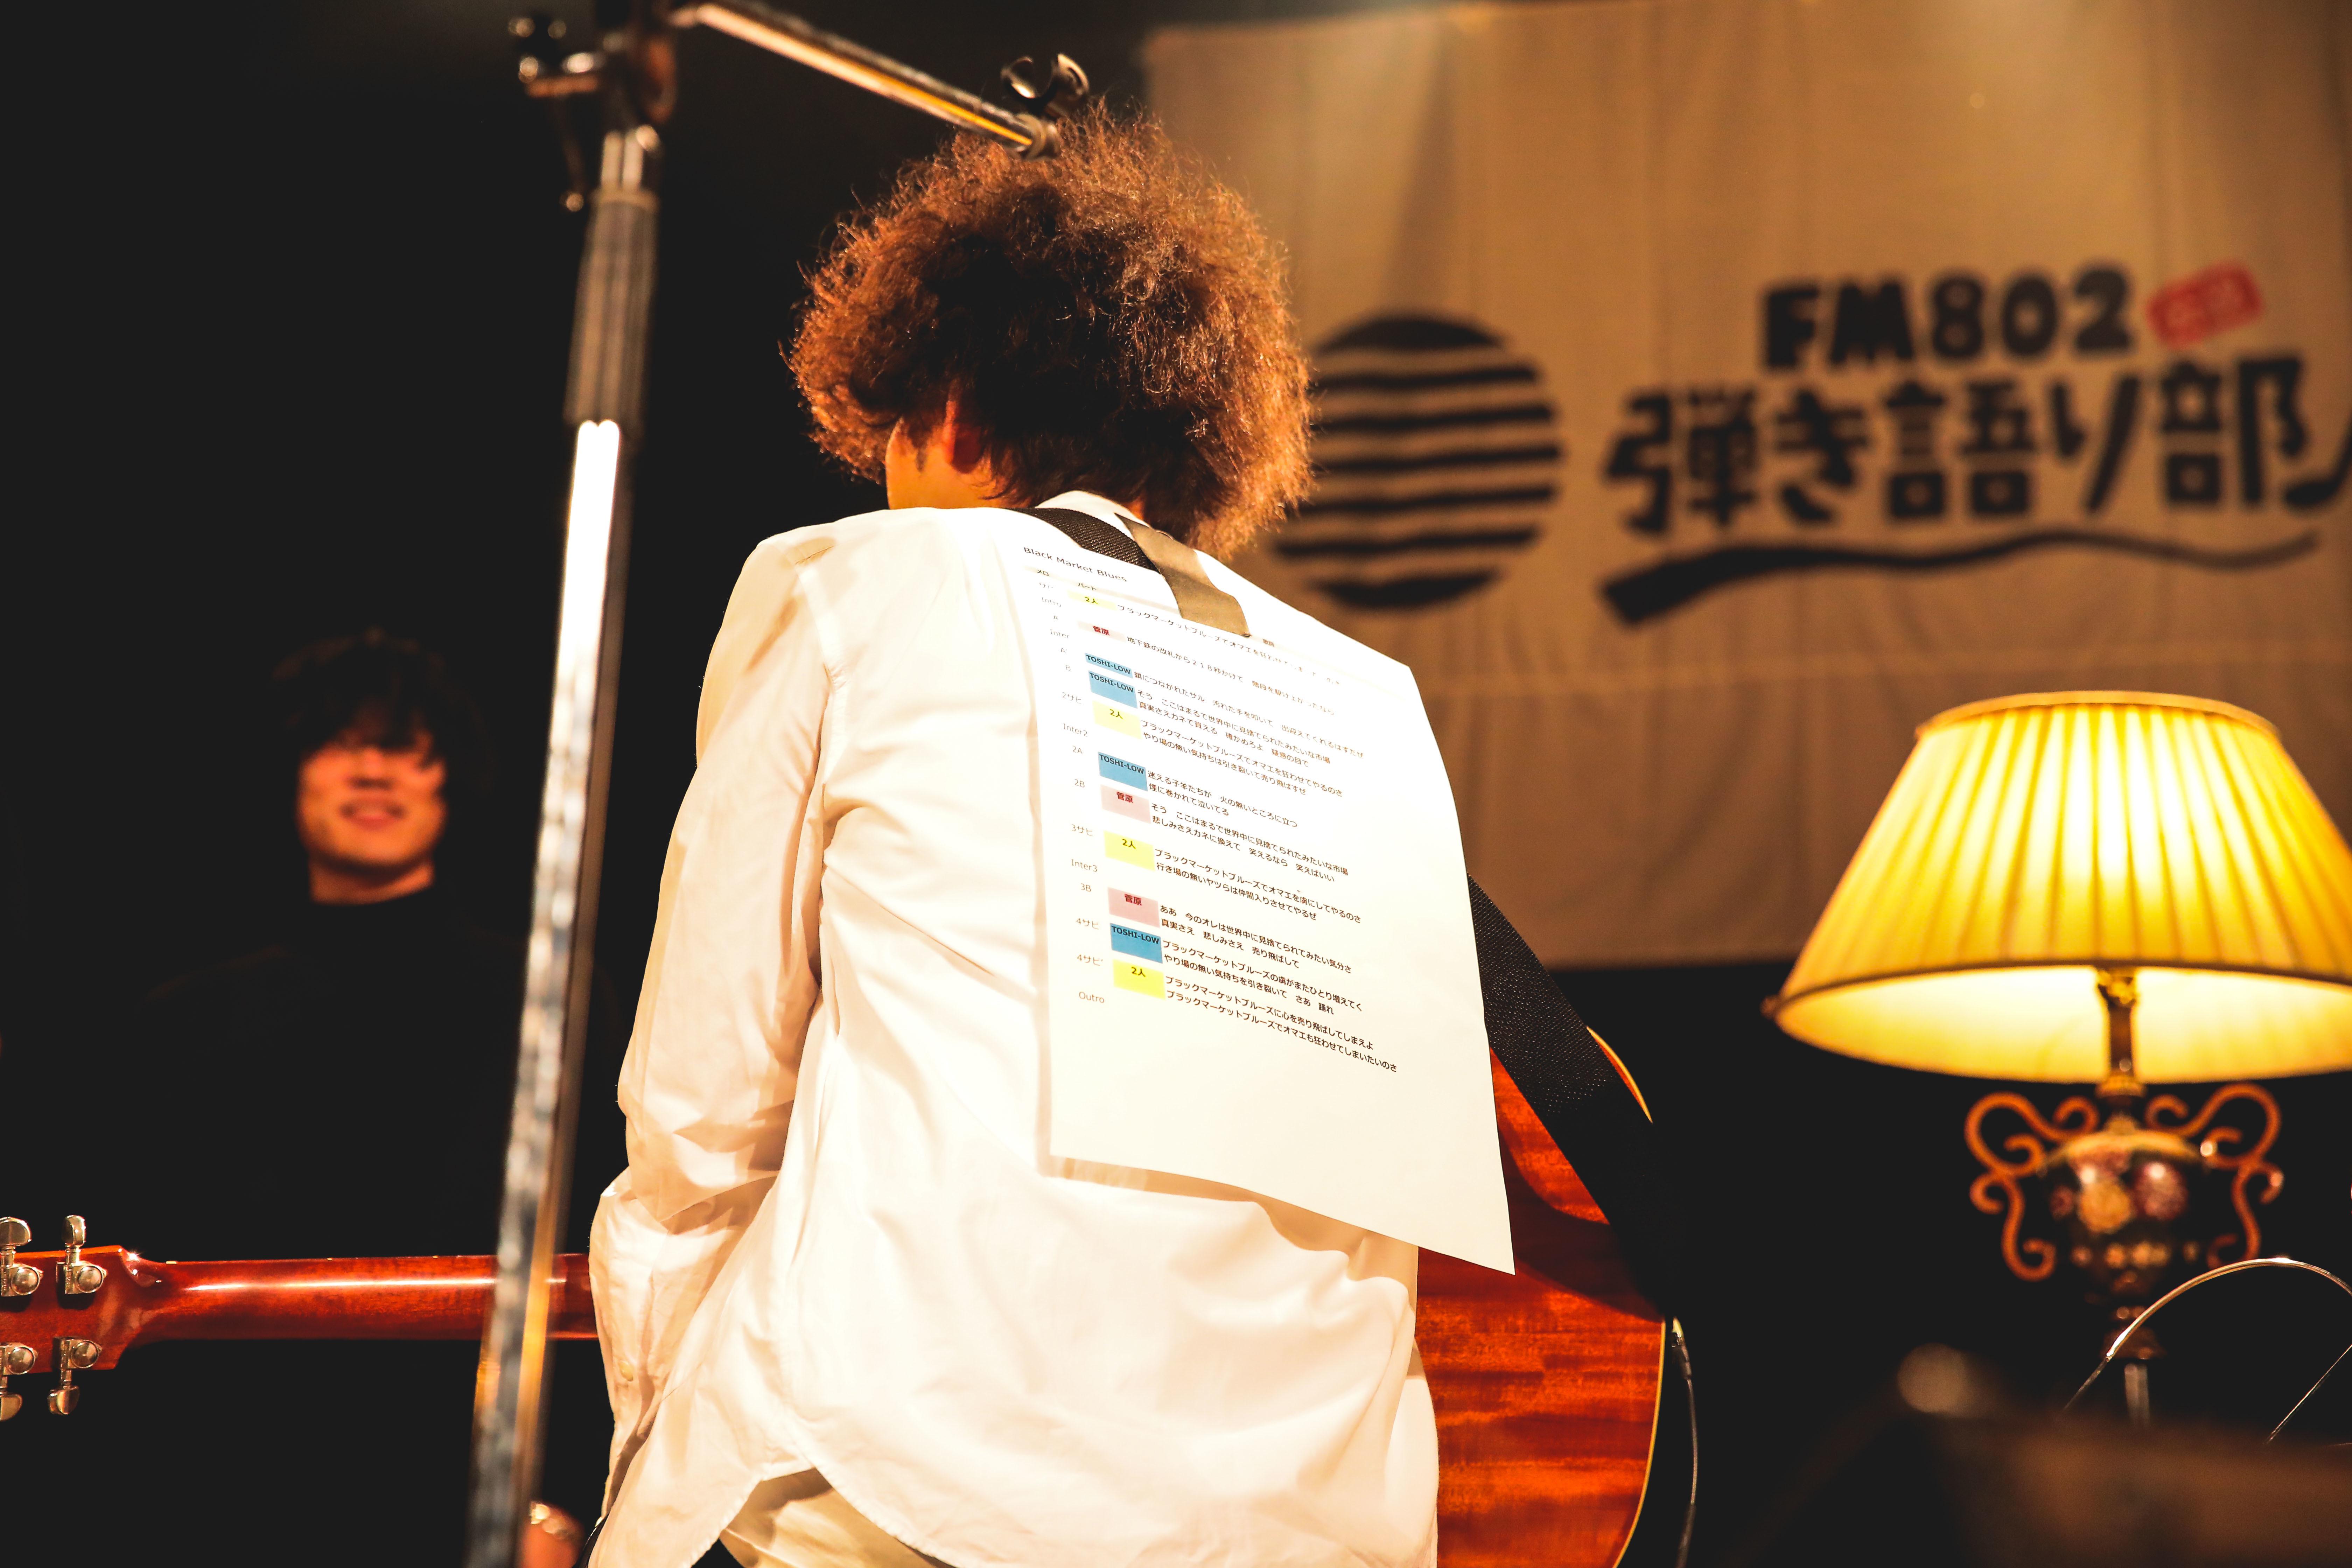 『FM802弾き語り部-リベンジ編♪-』